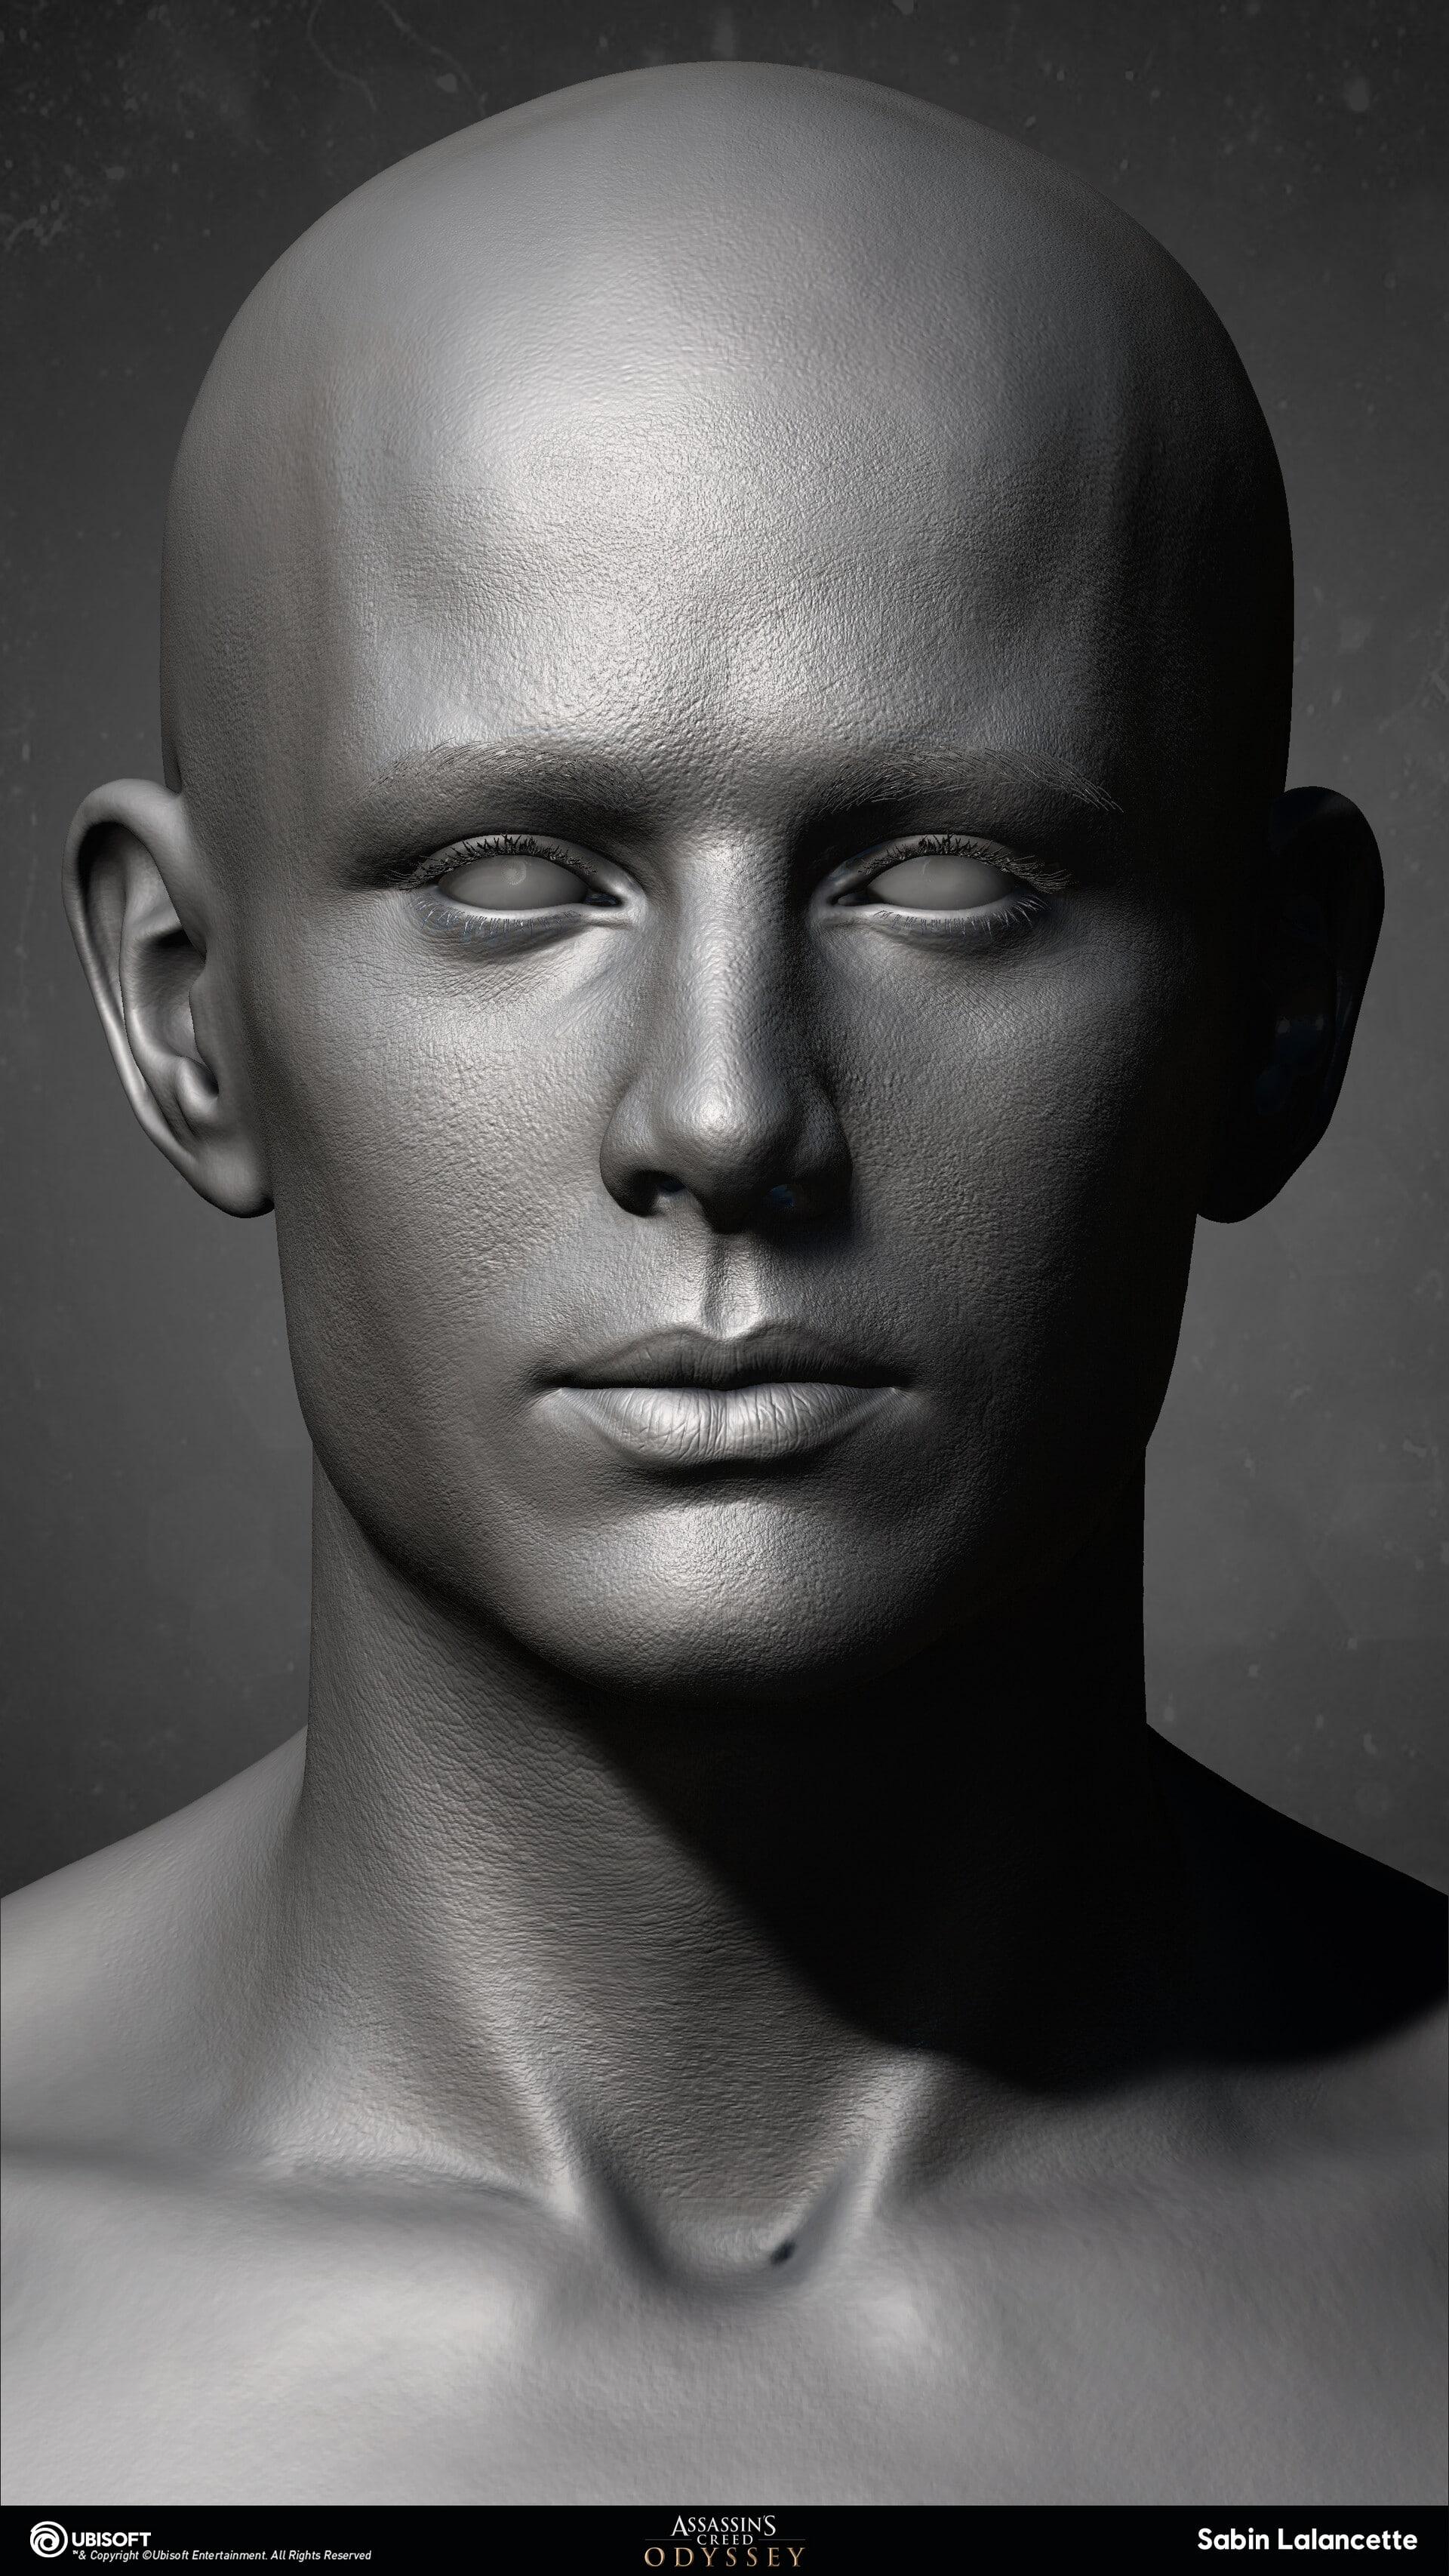 sabin-lalancette-artblast-fullsizezb-headf-hermes-slalancette